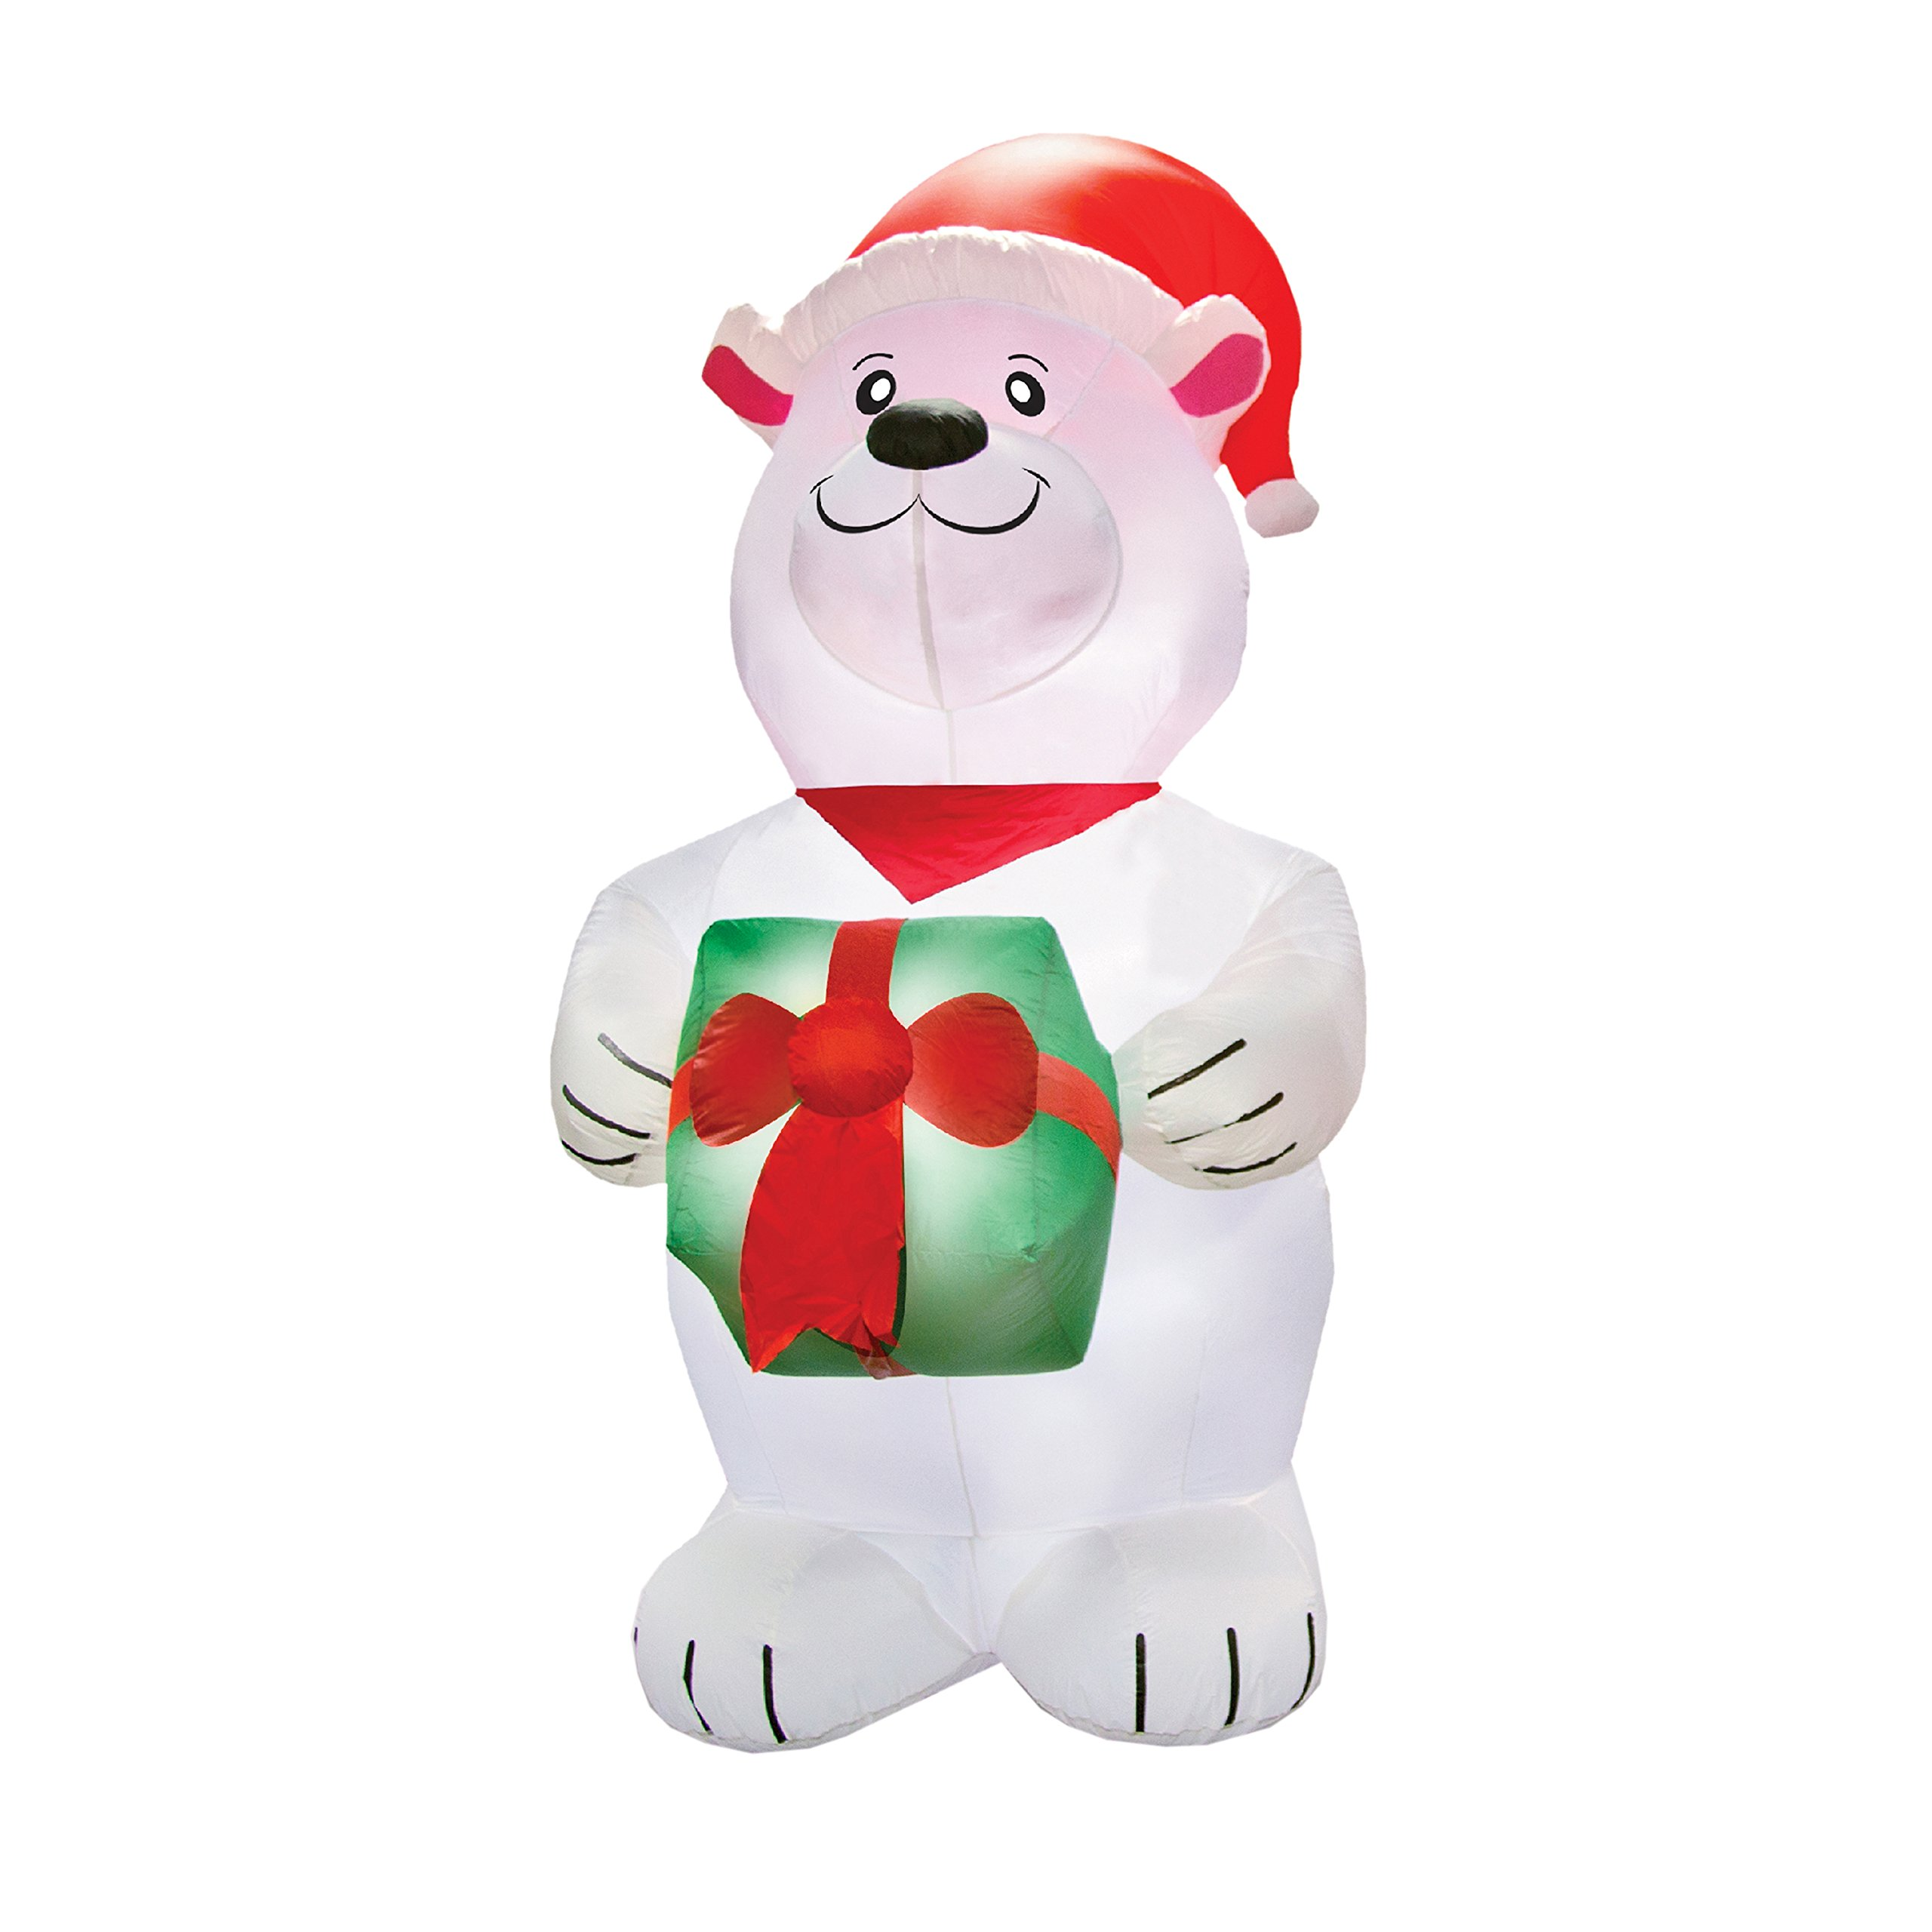 Airformz Airblown Inflatable Polar Bear Holiday Yard Decoration, 7.5 Feet Tall